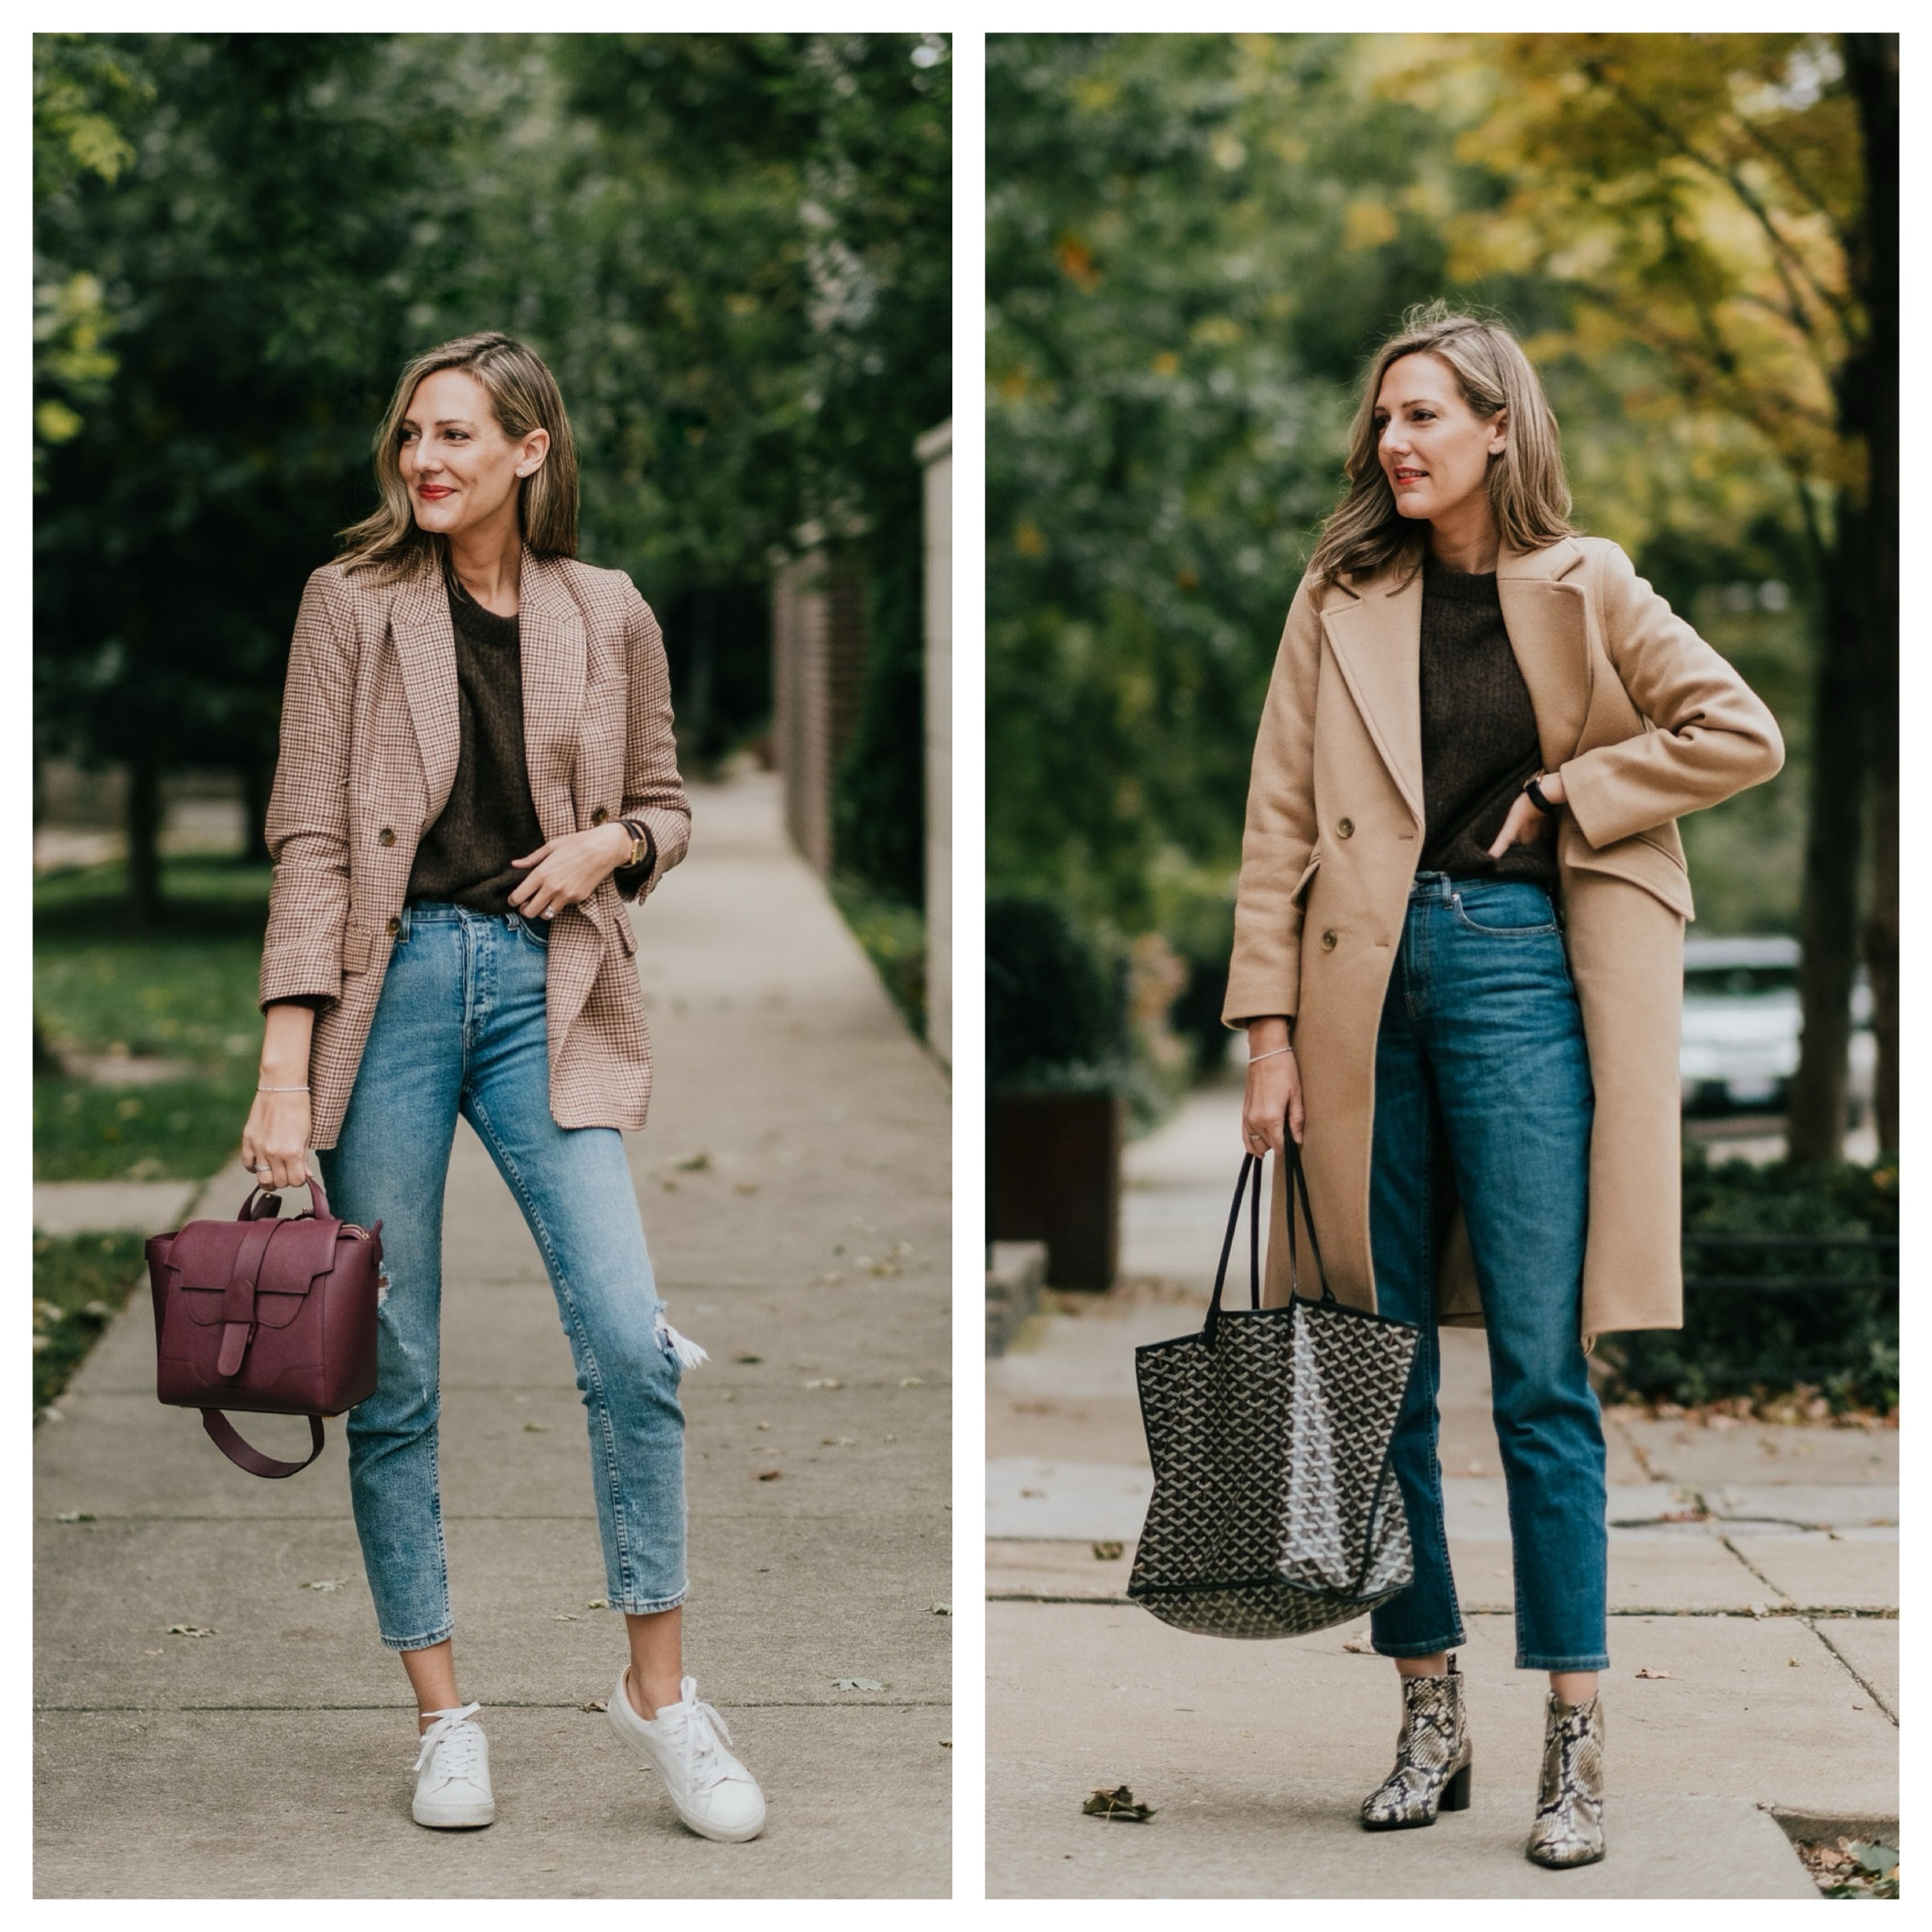 October Everlane picks fall classic style